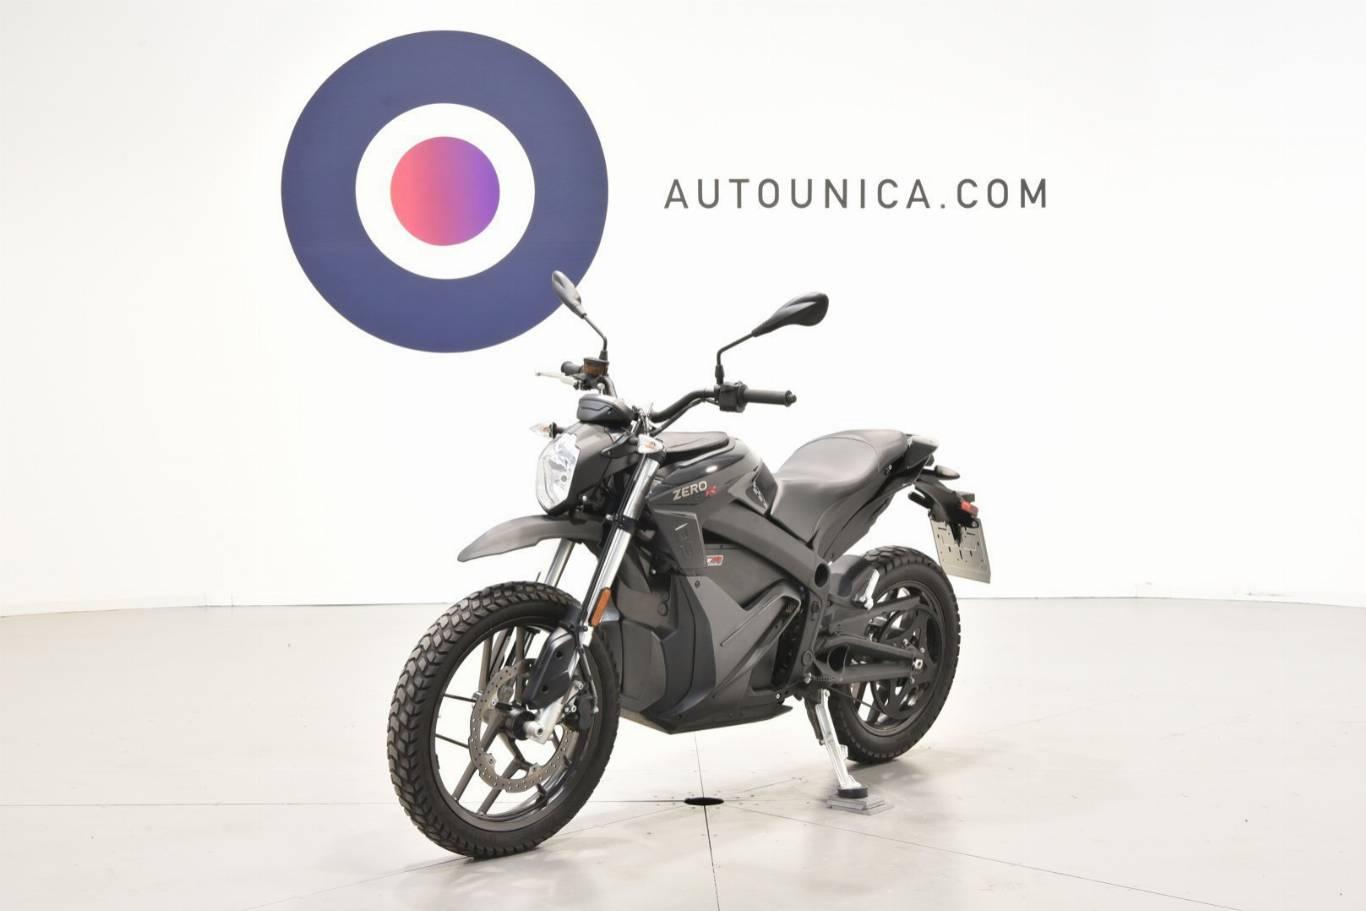 ZERO MOTORCYCLES - ZERO DSR ENDURO STRADALE